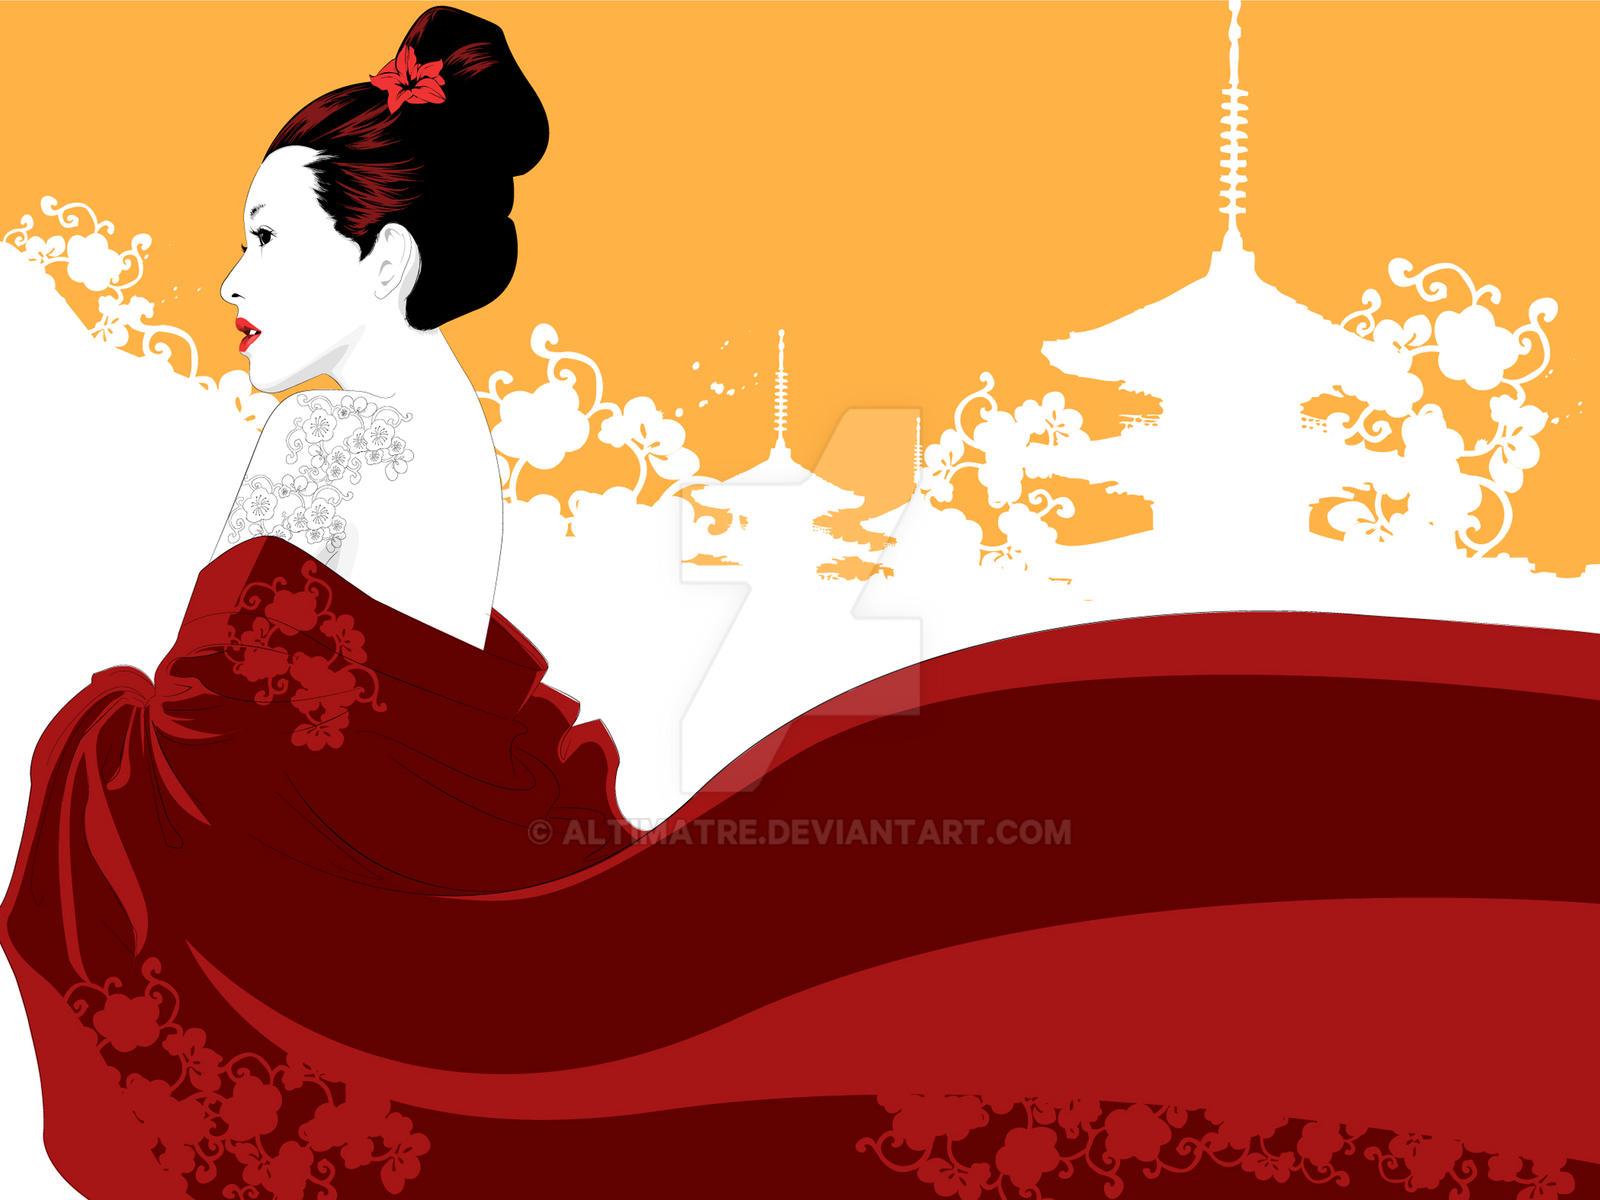 + Memoirs of a Geisha by Altimatre